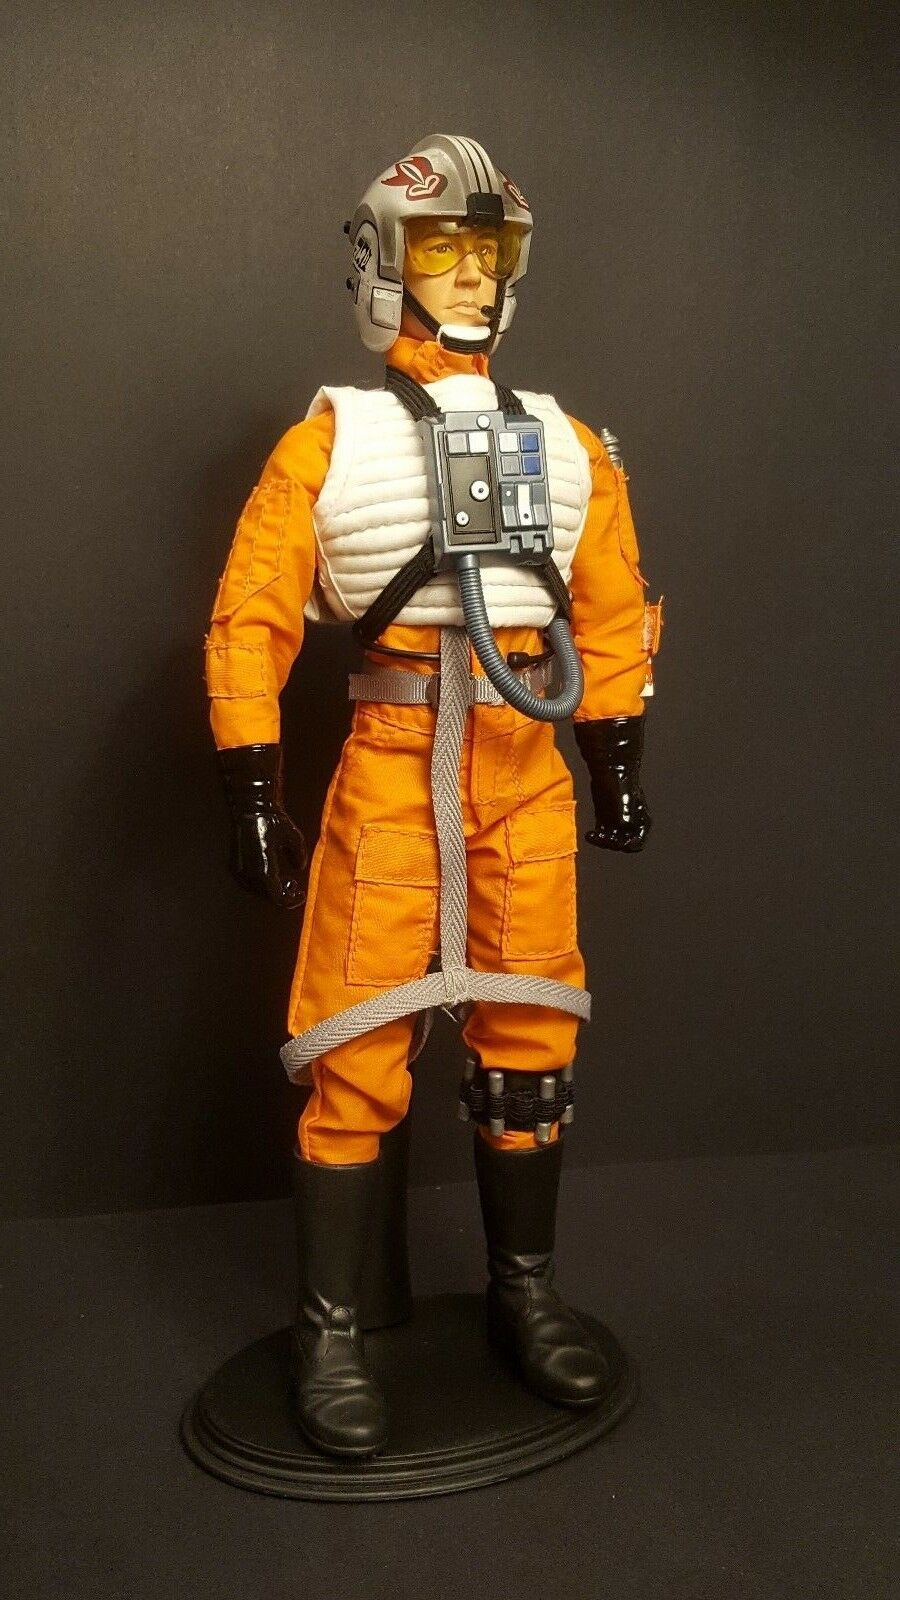 Star wars rogue eins x-wing pilot bild 1   6 - skala, 12  groß